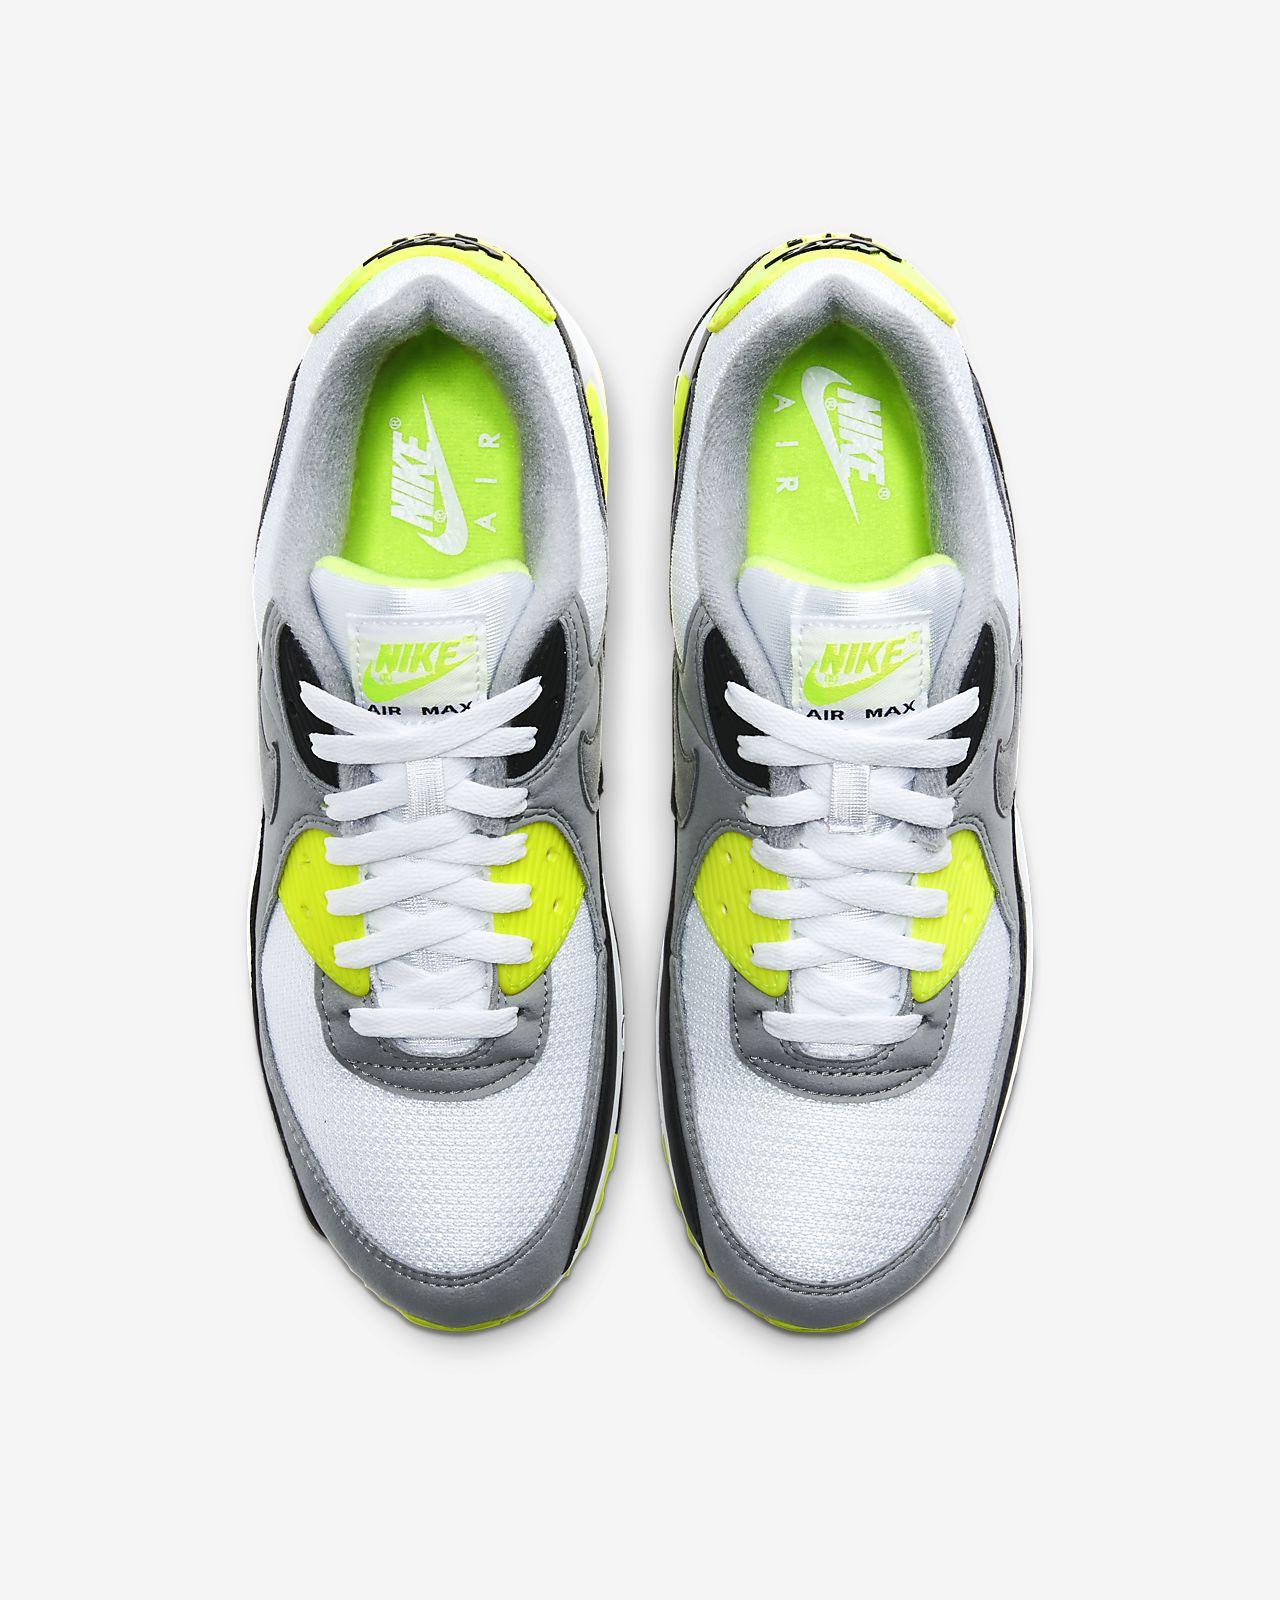 Nike Air Max Lunar 90 – White Pink Less is Best